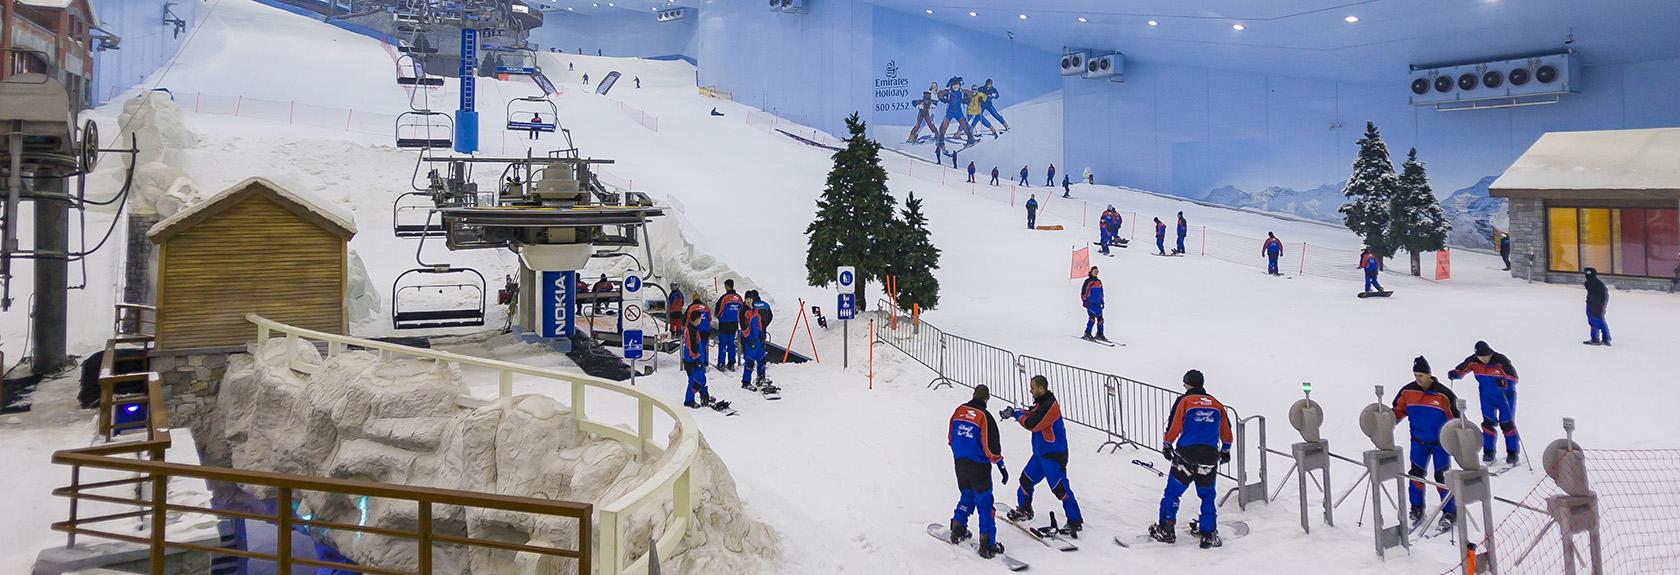 Tickets voor Ski Dubai